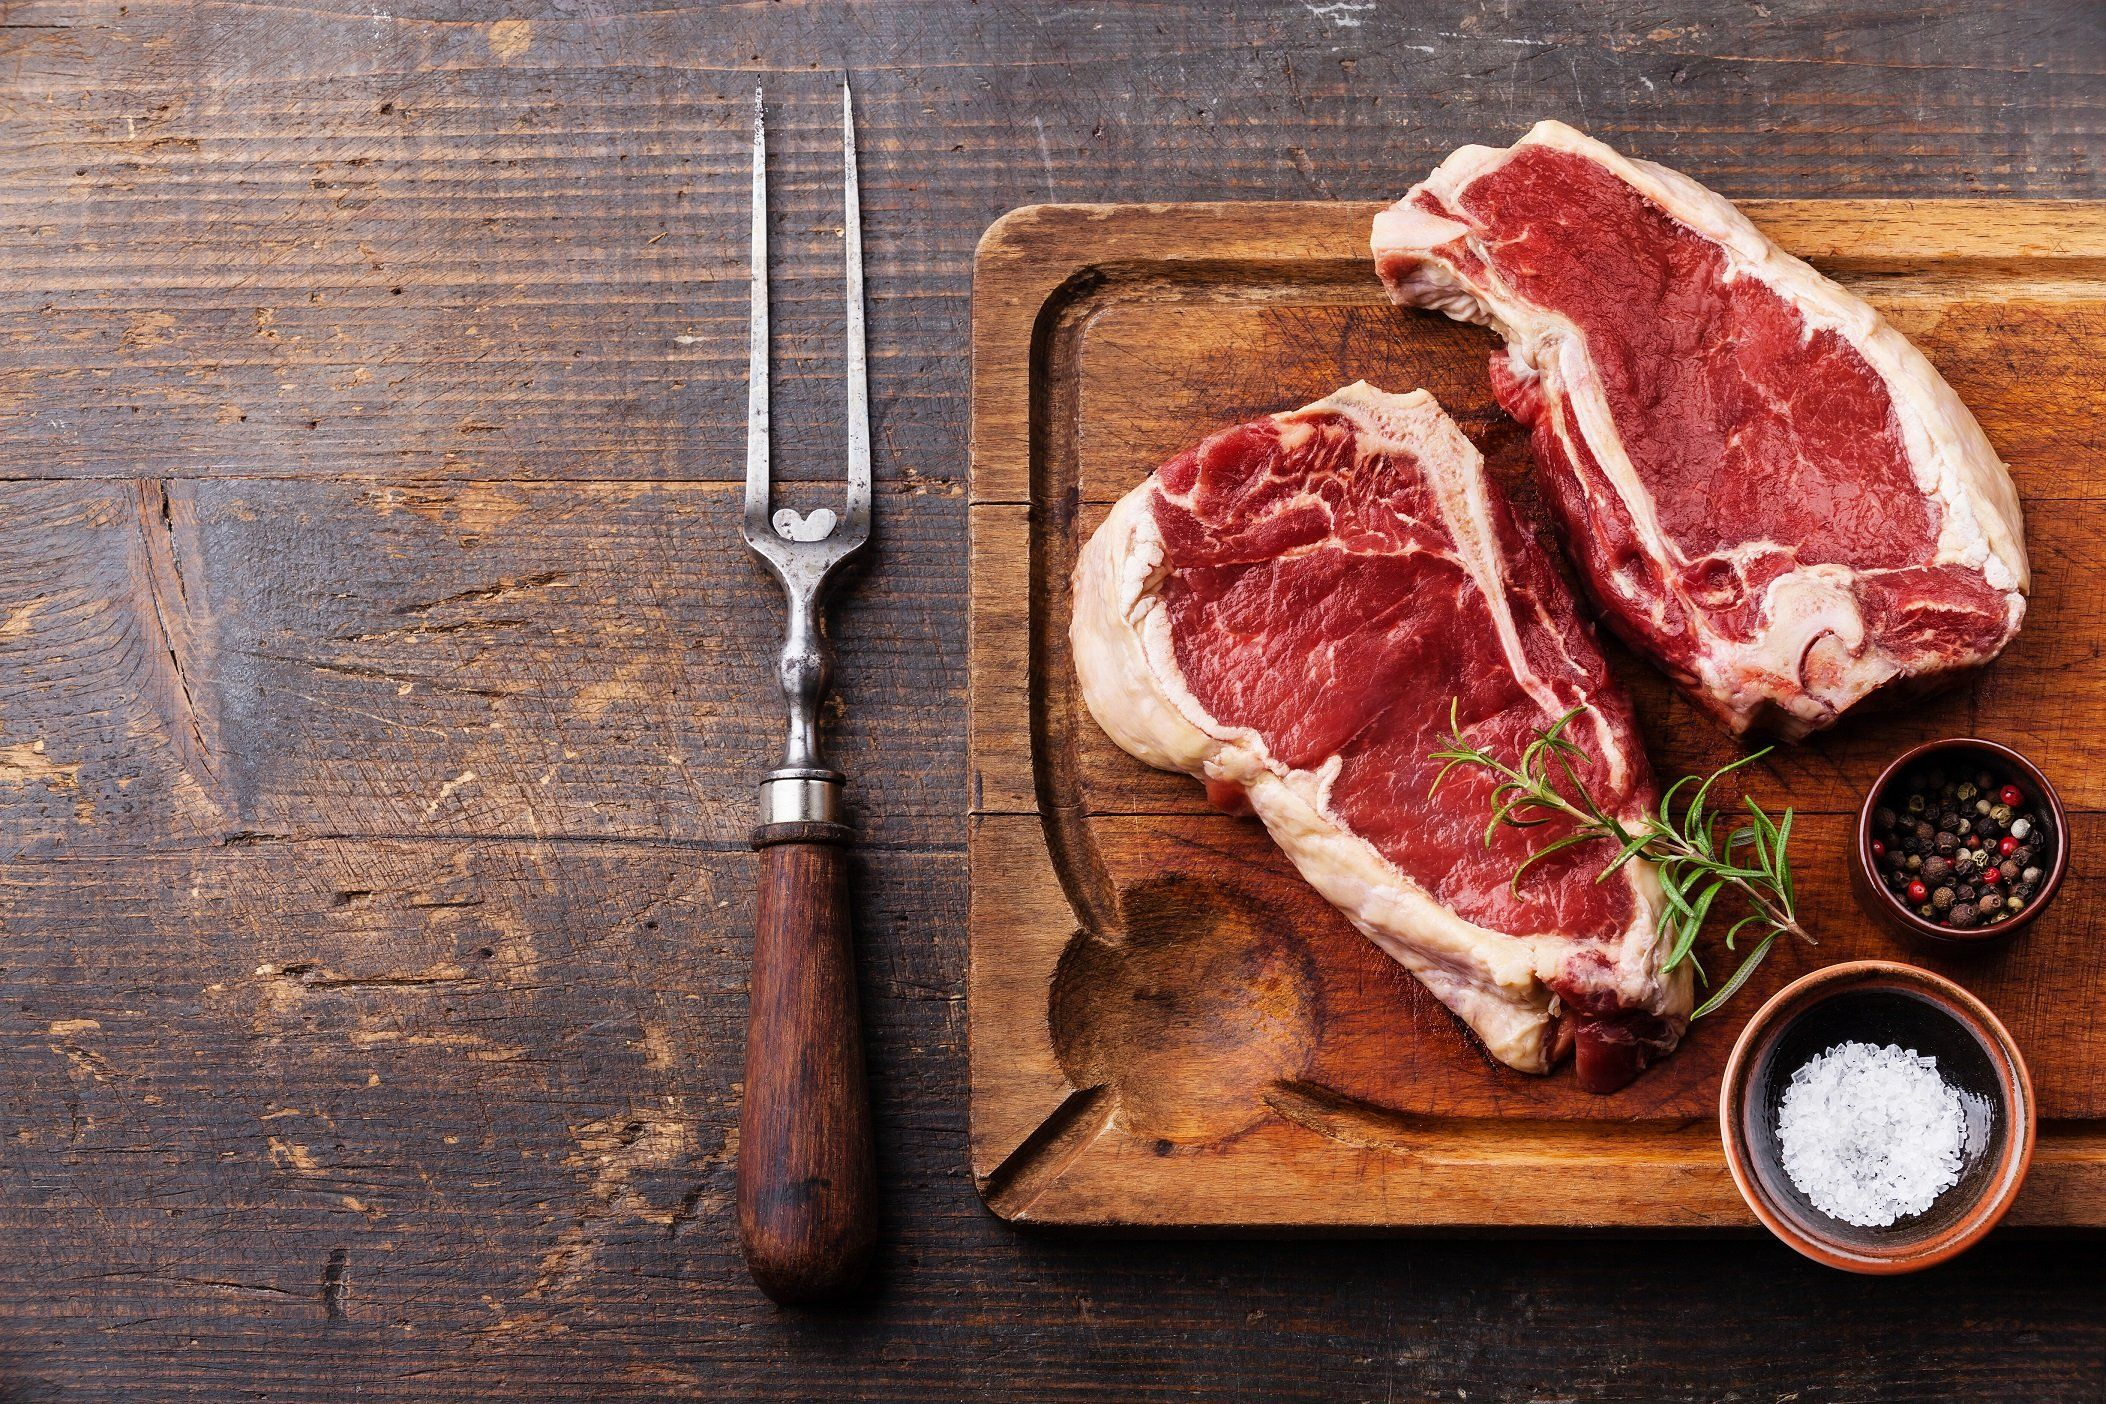 Free-Range Meat